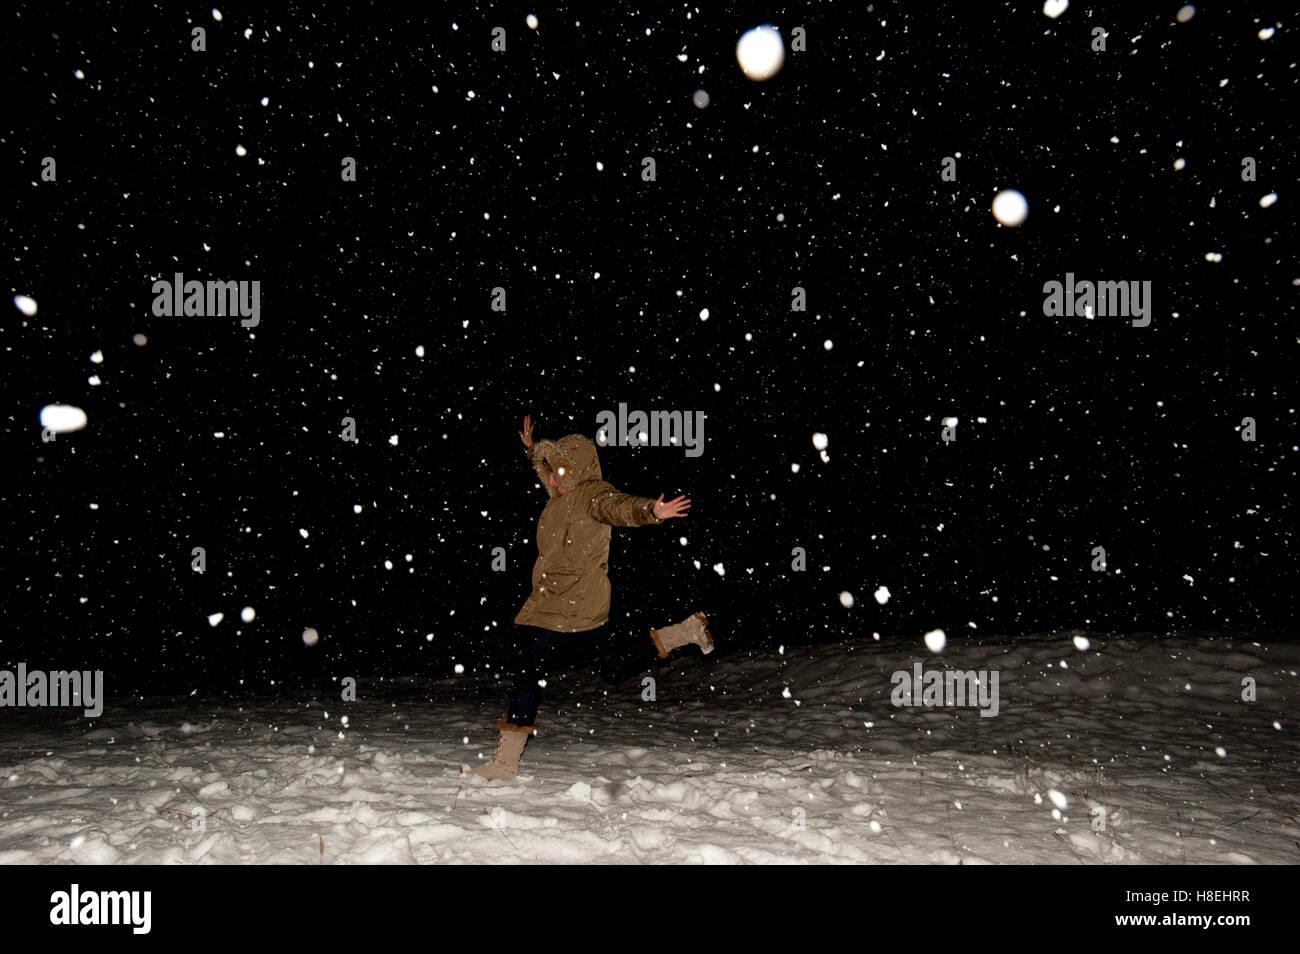 Snowfall at night lit up by a flashgun, Falcade, The Dolomites, Italy, Europe - Stock Image